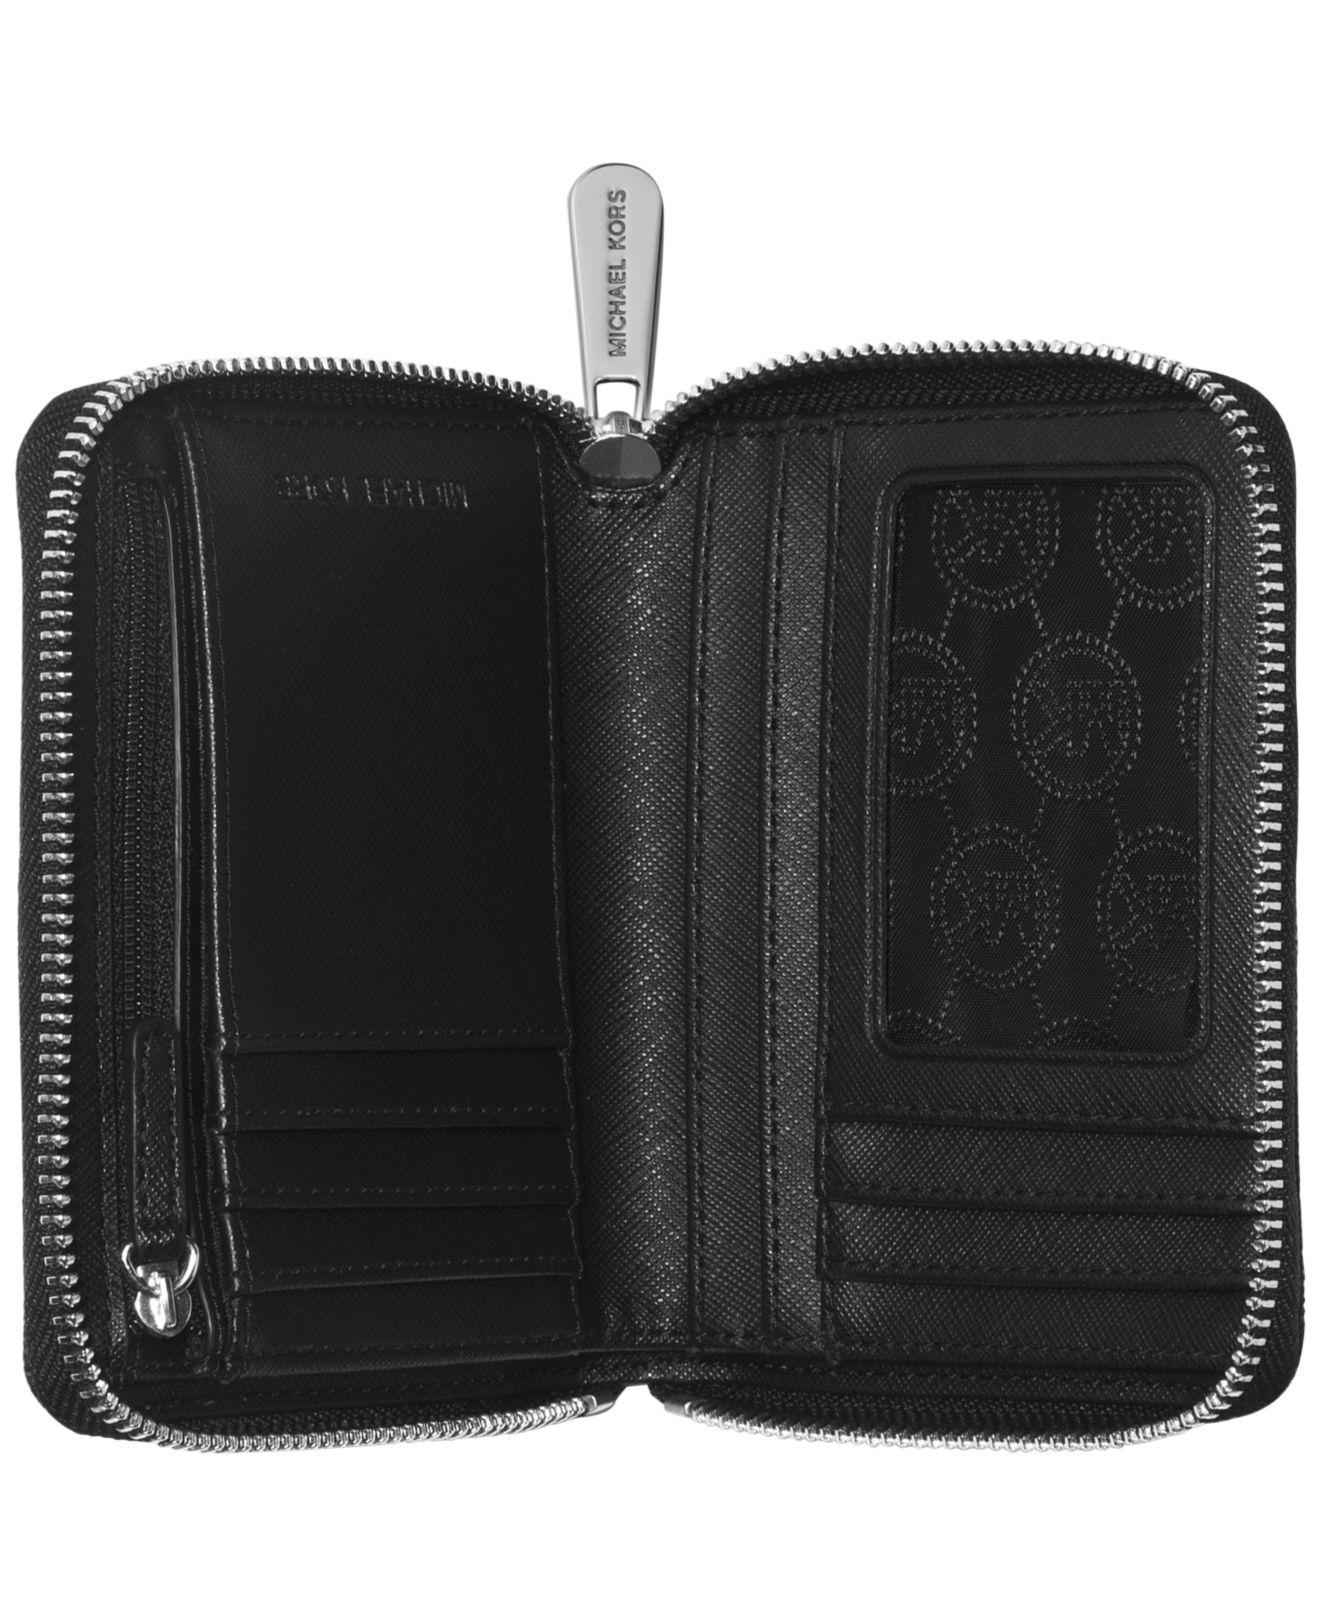 413d91e30ef86d Michael Kors Michael Jet Set Item Medium Zip Around Wallet in Black ...